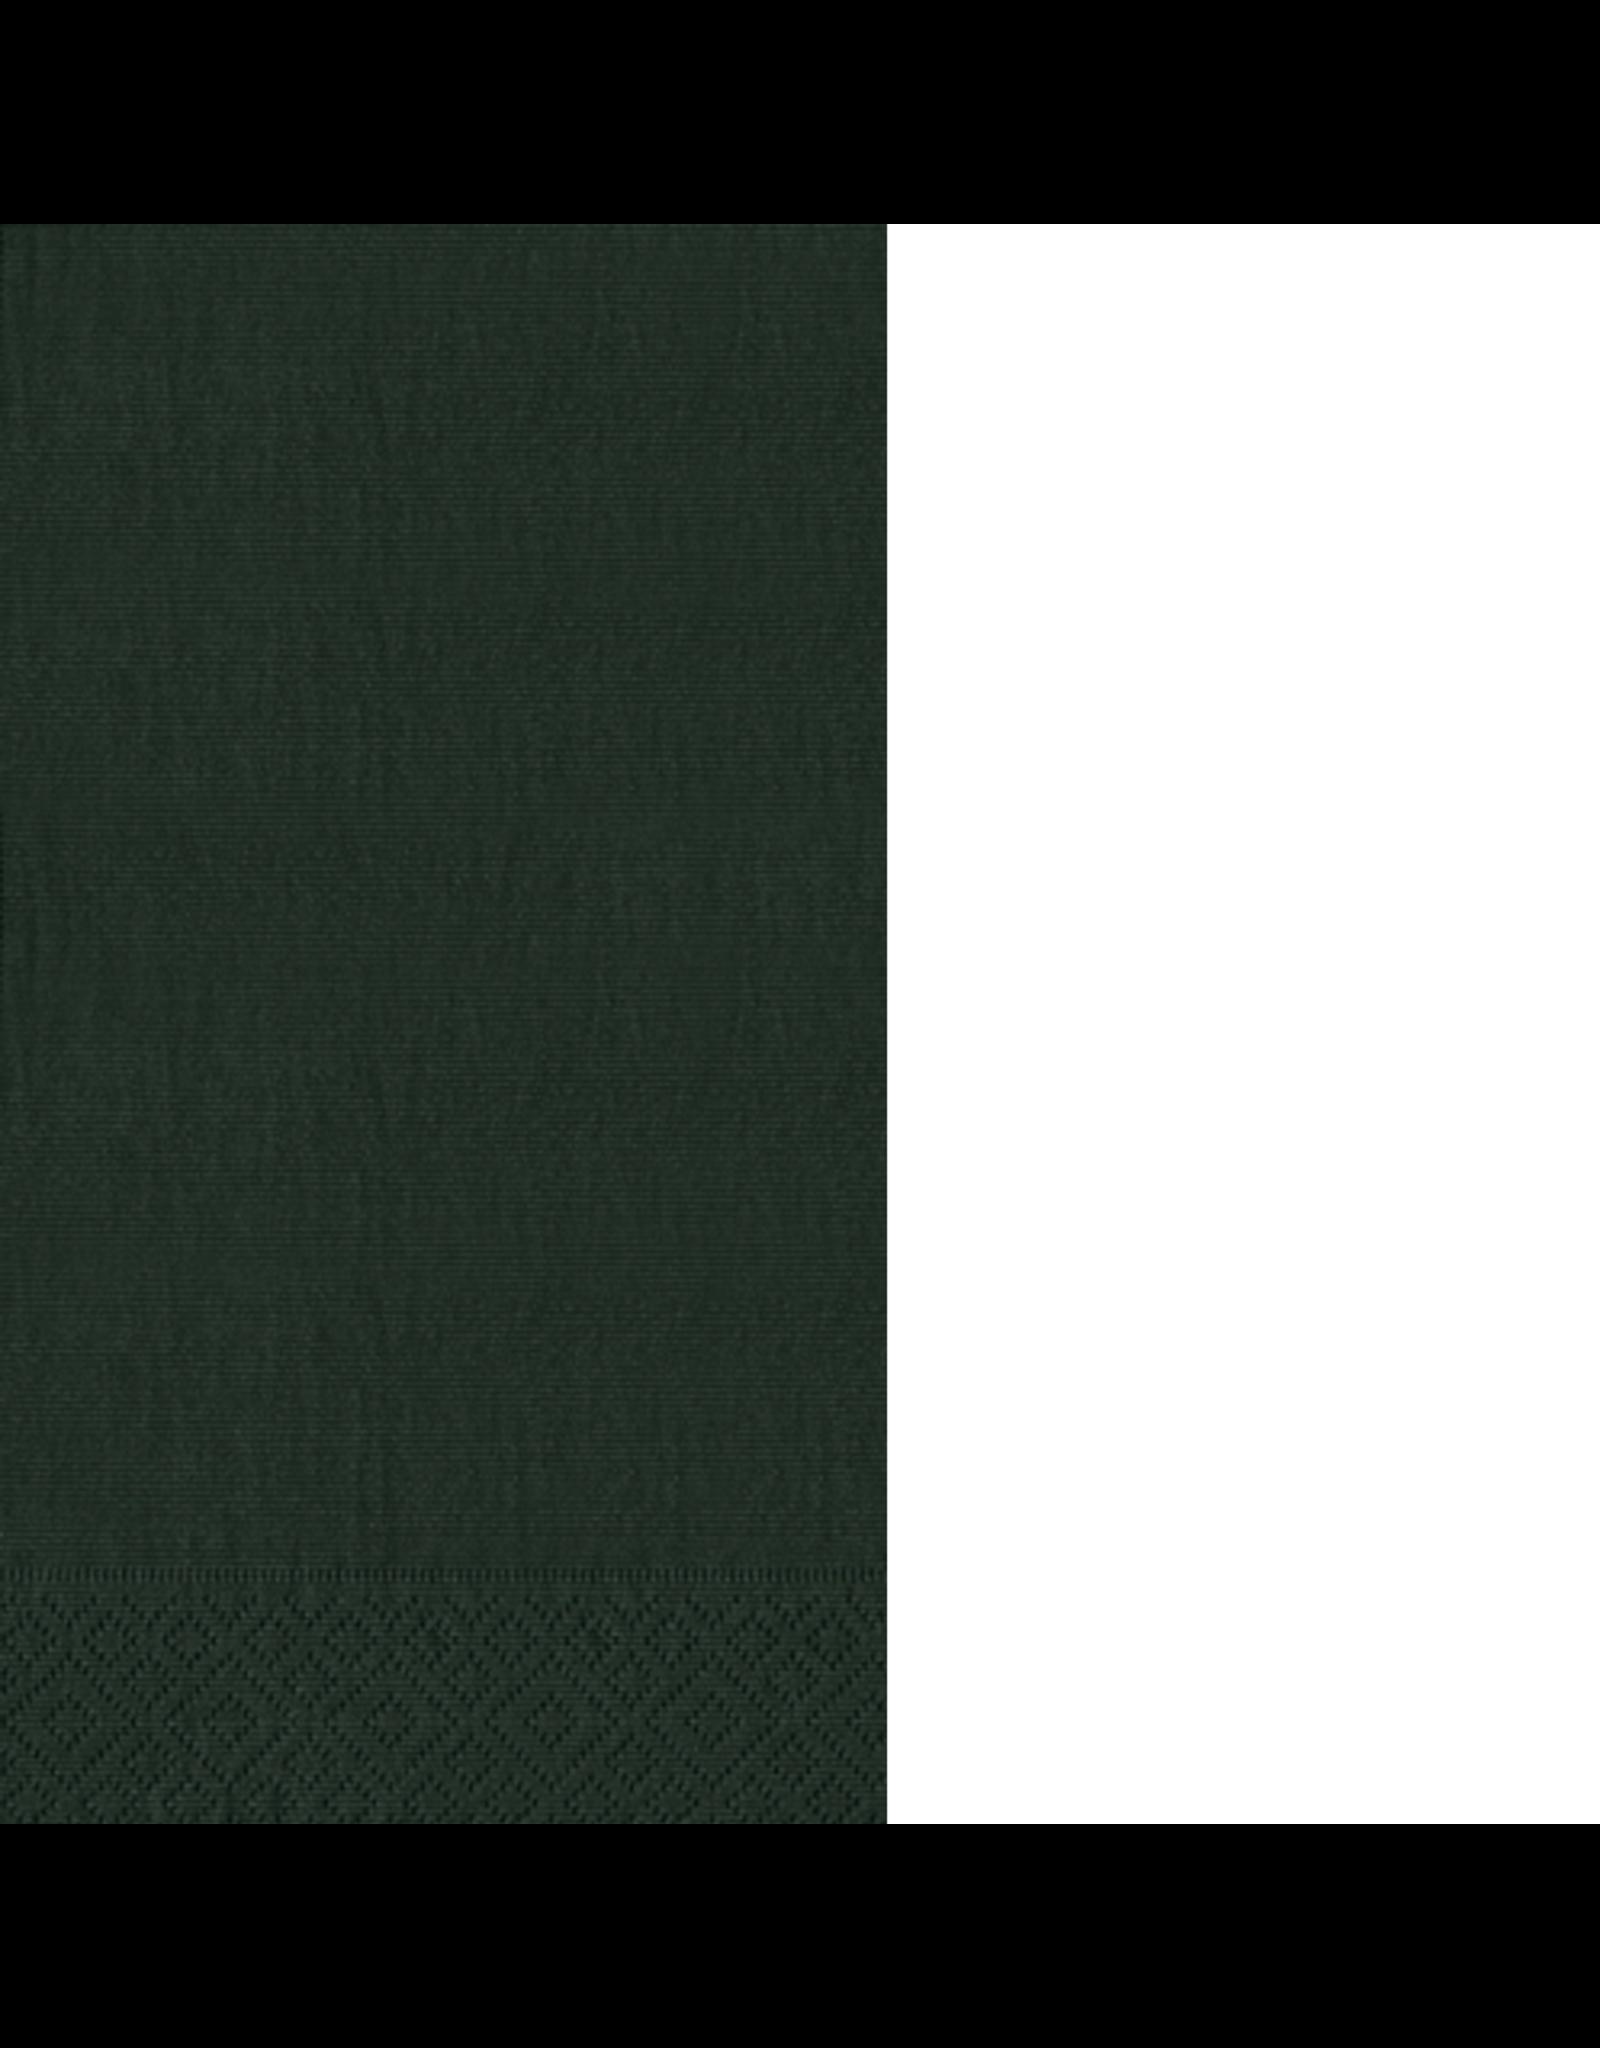 Caspari Paper Guest Towel Napkins 15ct Grosgrain Black